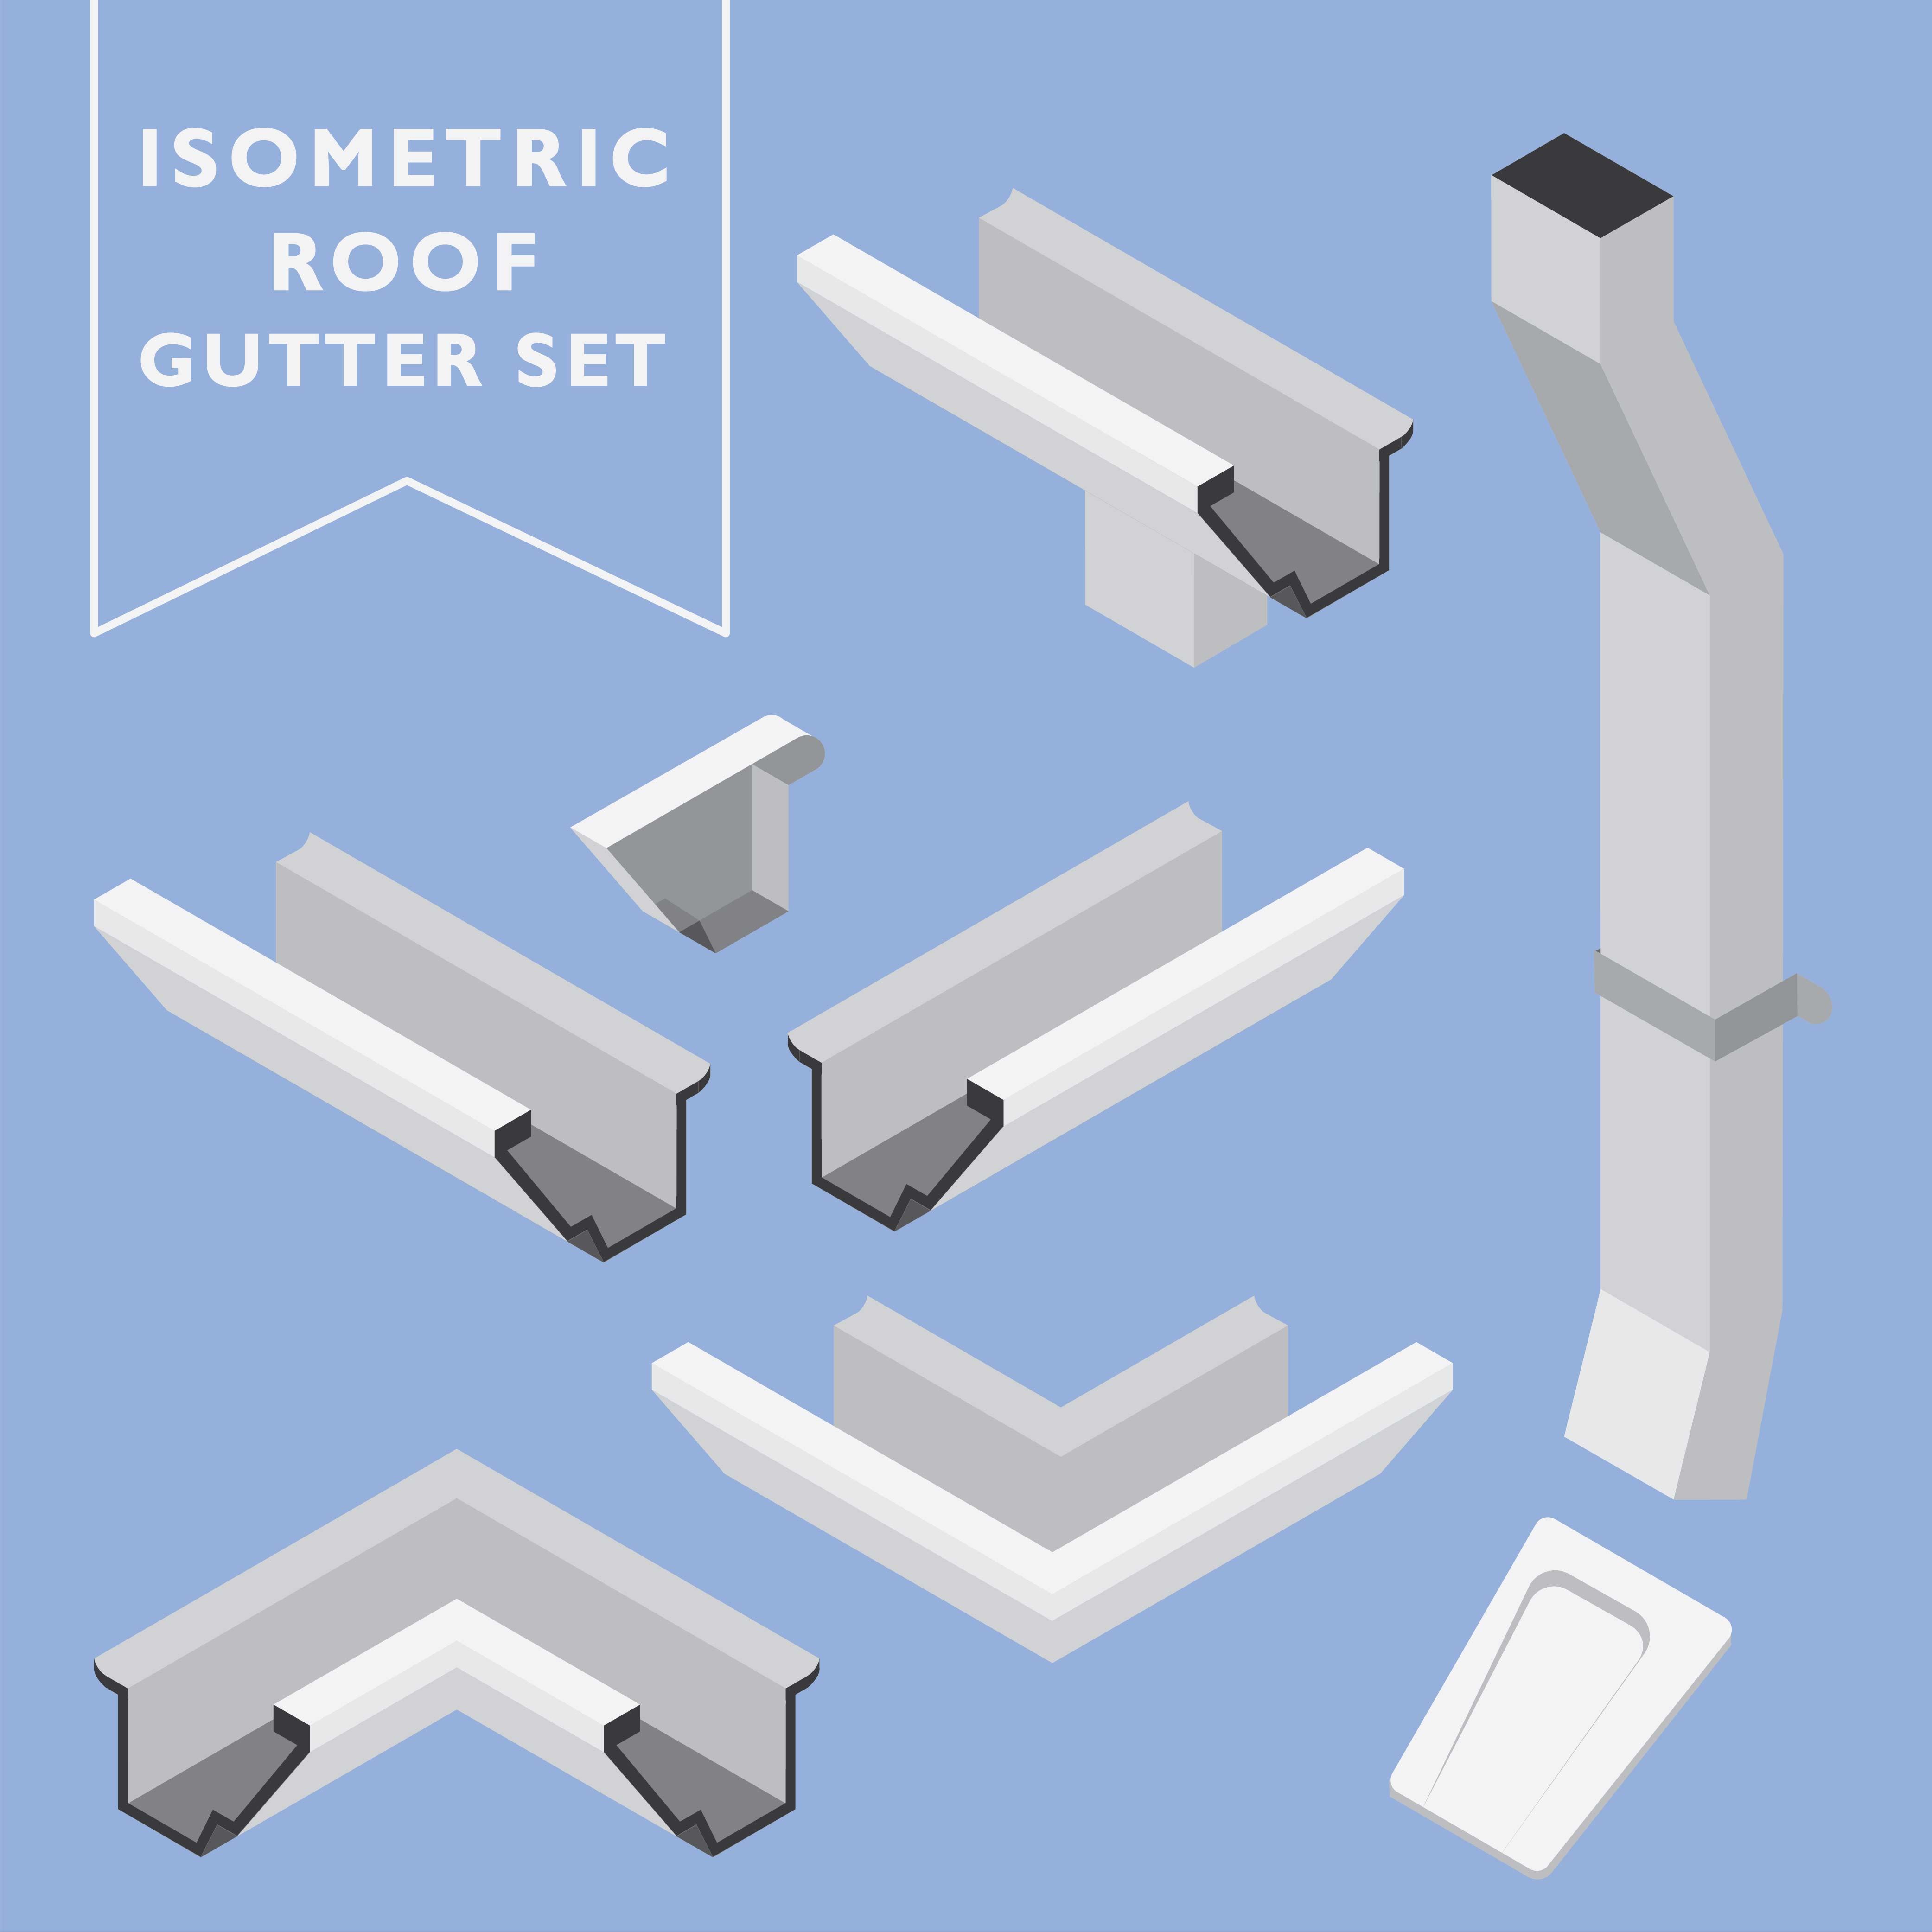 Isometric Roof Gutter Set Vector Download Free Vector